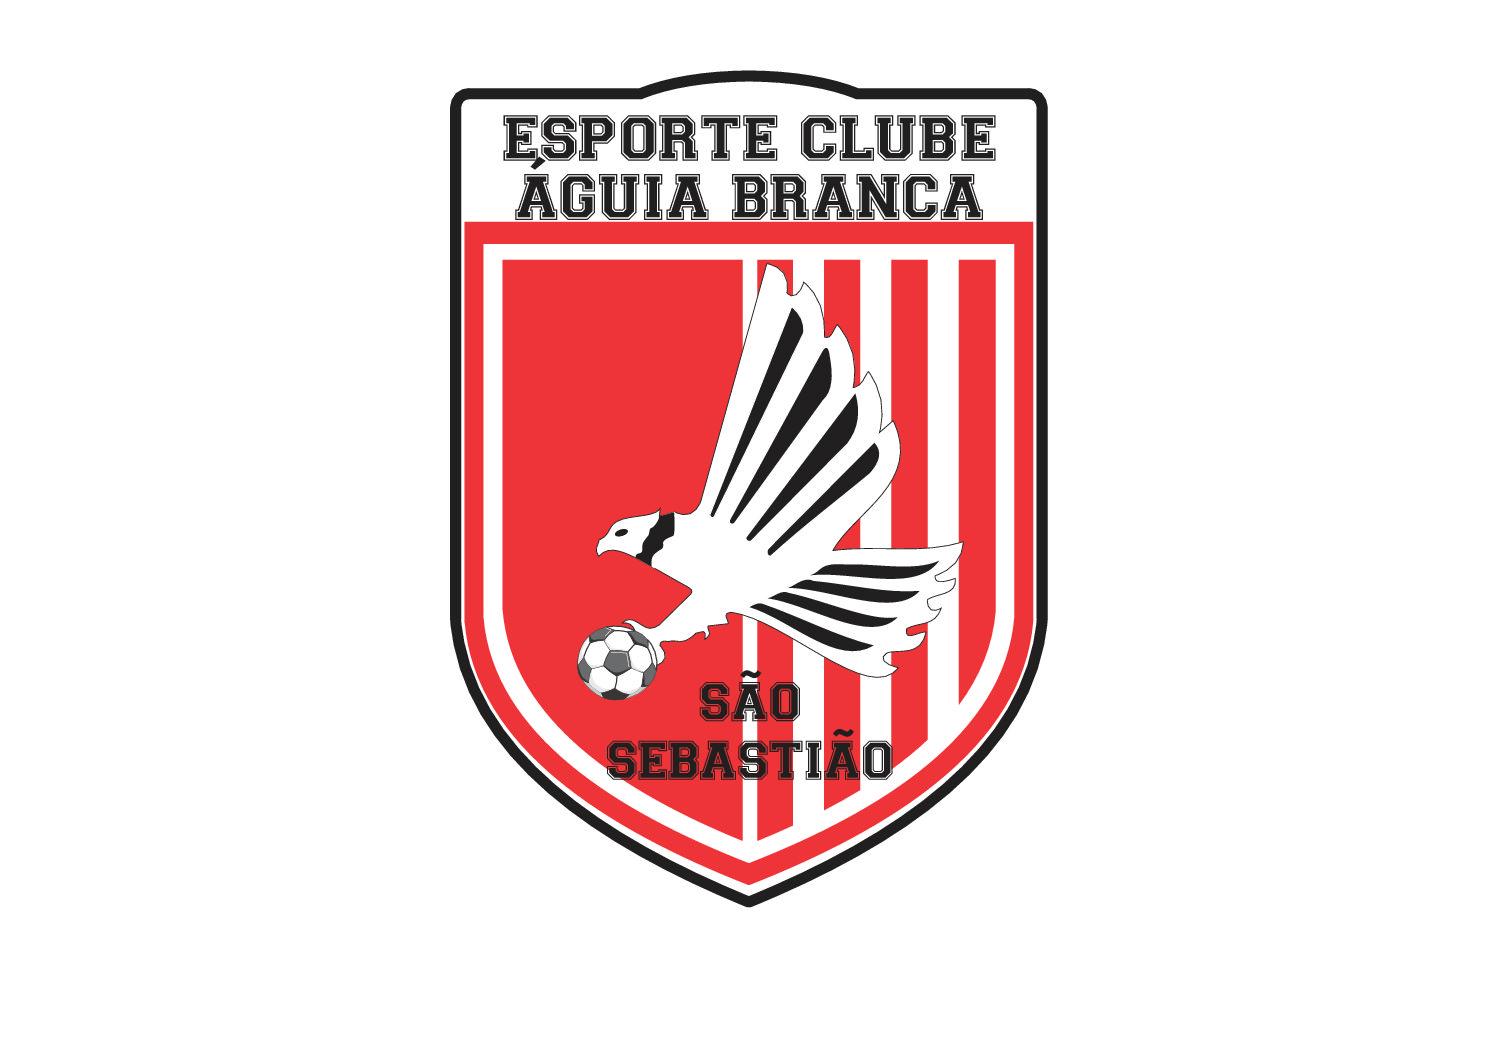 ESPORTE CLUBE ÁGUIA BRANCA